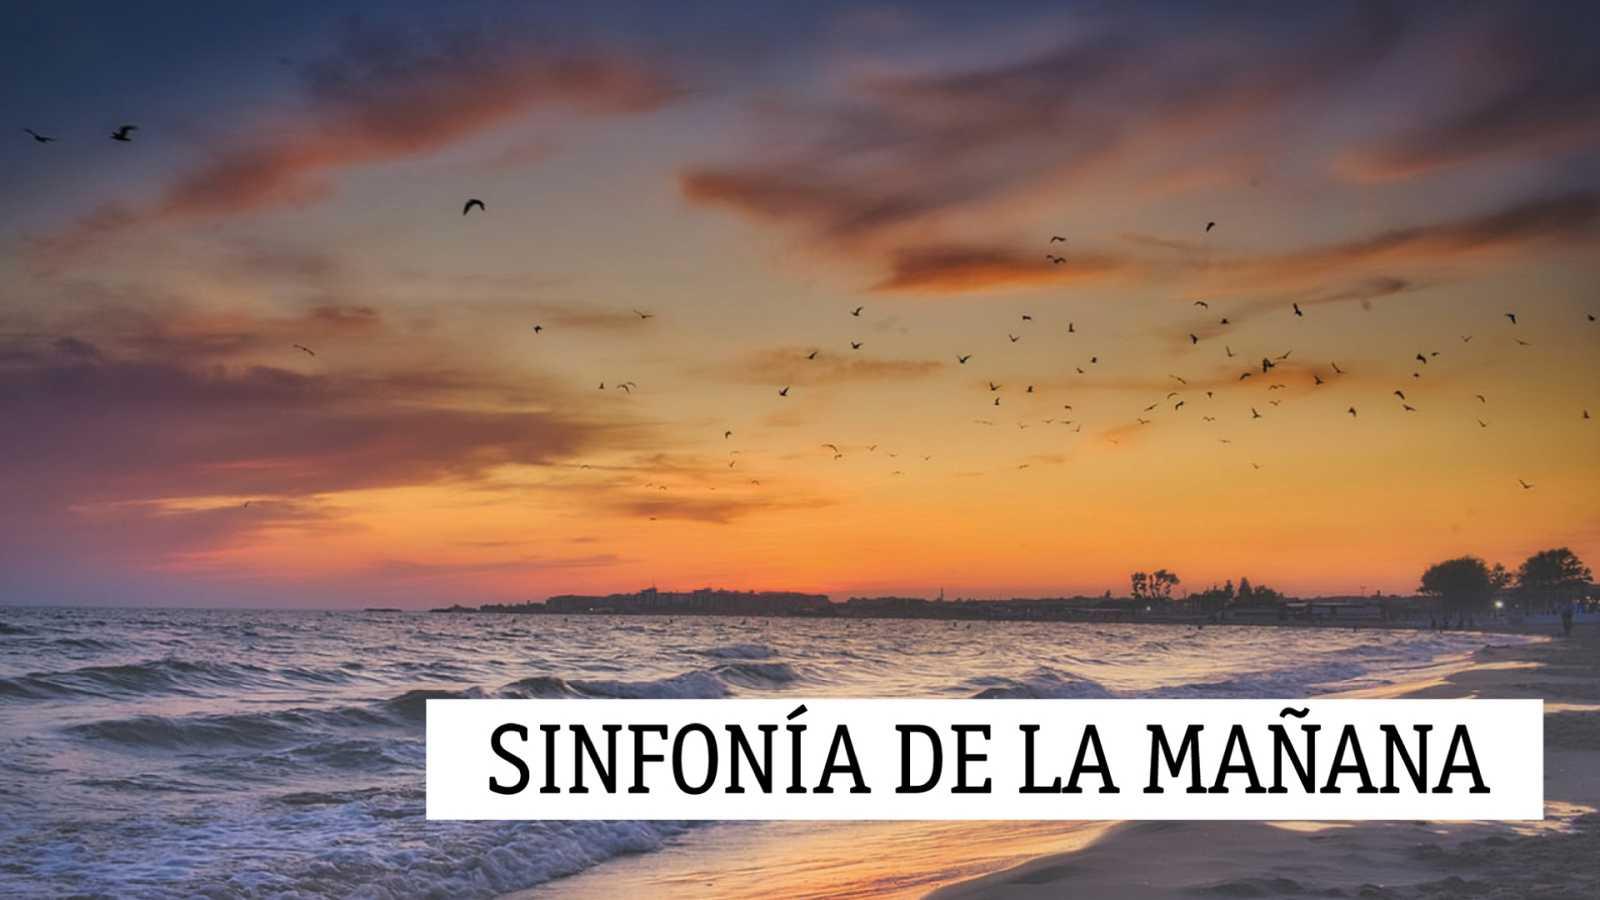 Sinfonía de la mañana - Jack el destripador - 16/02/21 - escuchar ahora